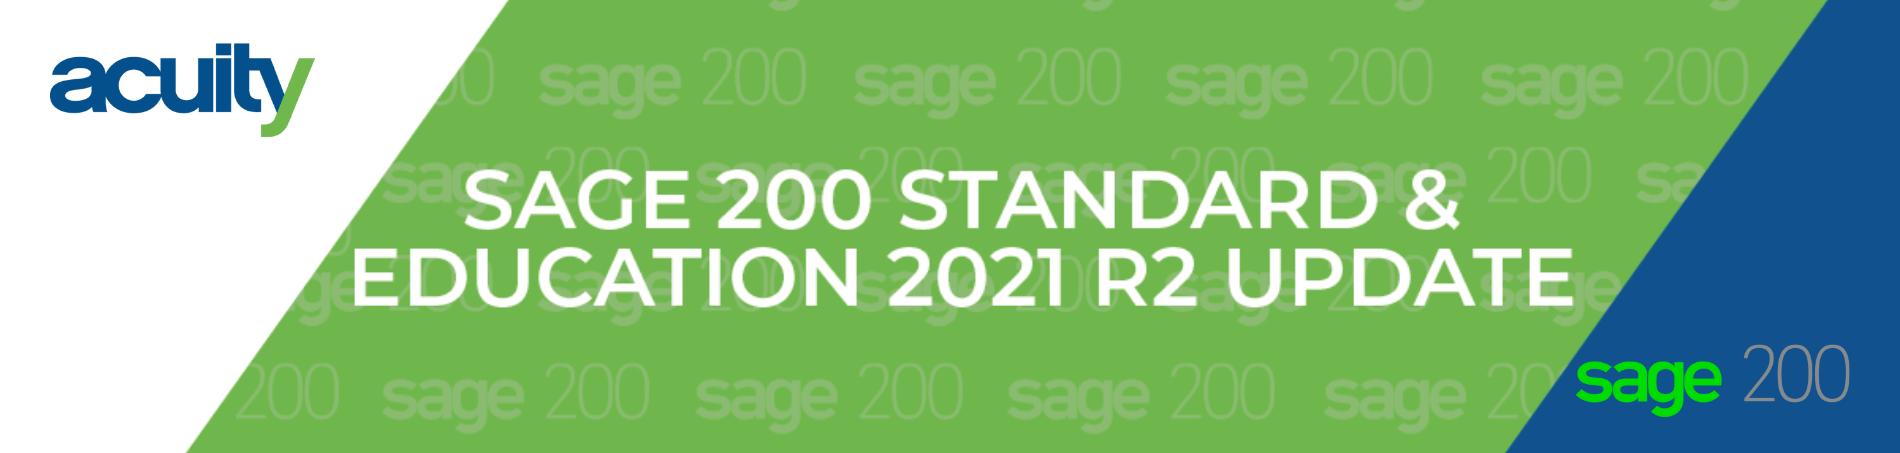 sage 200 standard